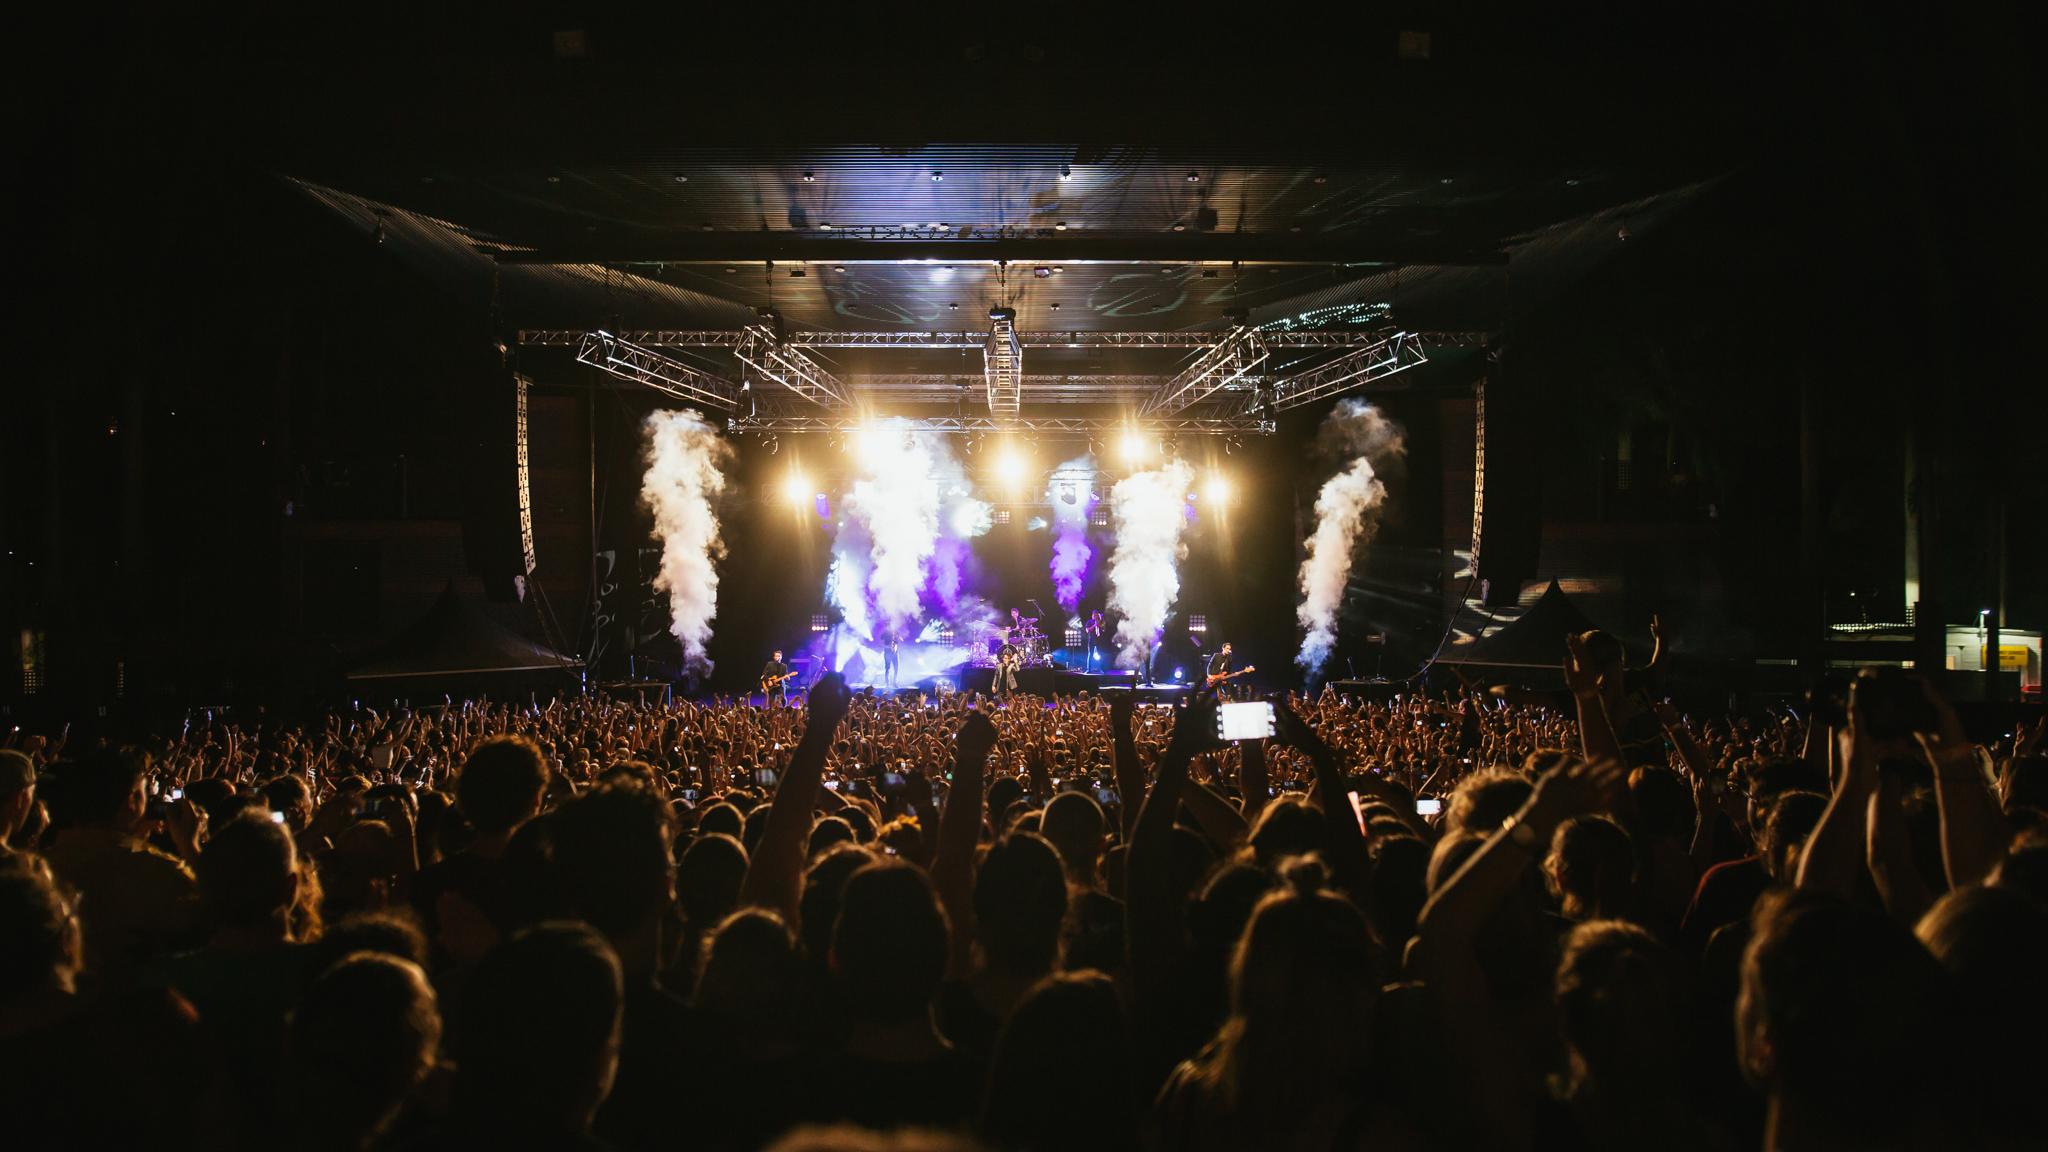 Mitch Lowe Photo - Panic At The Disco - Riverstage-62.jpg